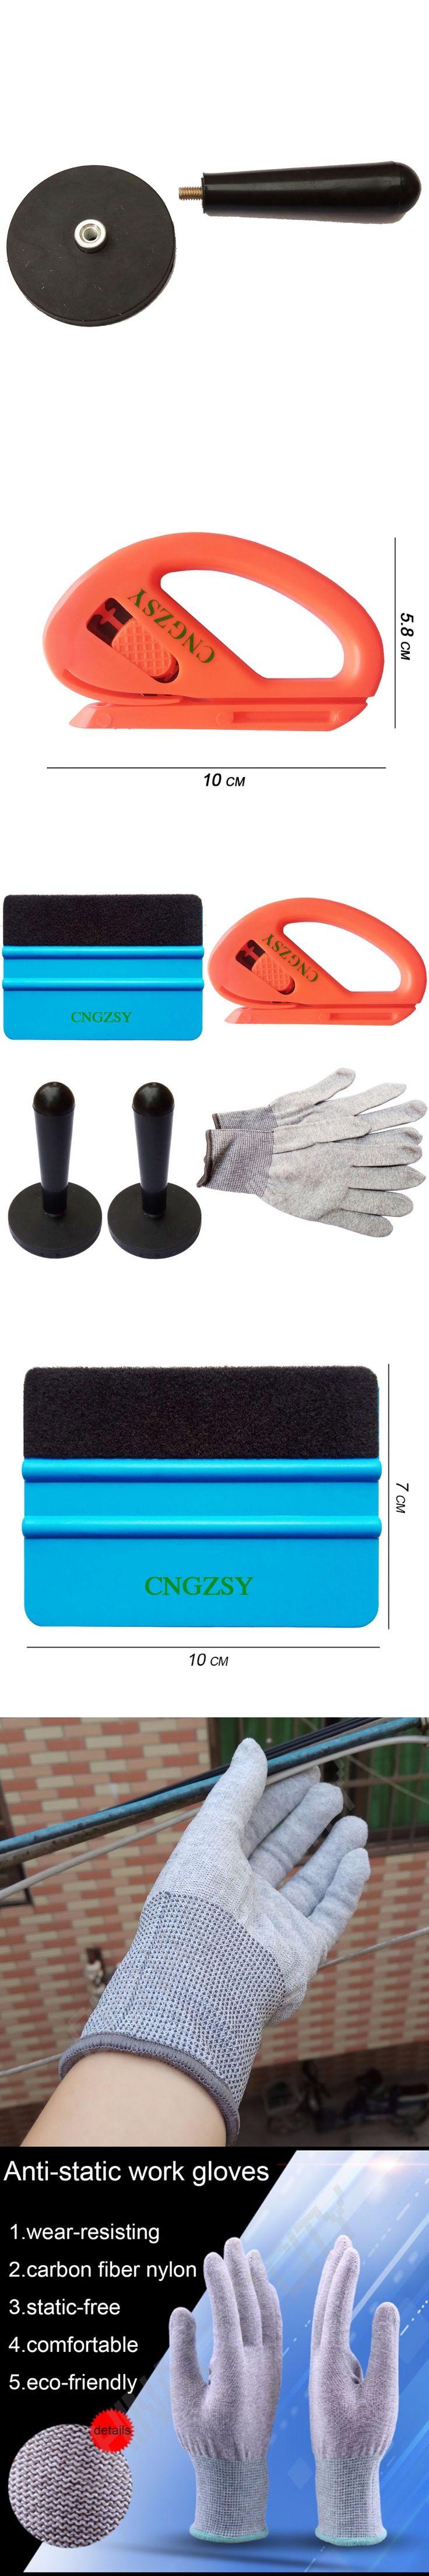 Car Wrap Tools Set 1PC 3M Squeegee 1PC Car Wrap Cutter 1 Pair Gloves 2PCS Car Wrap Magnet Holders Car Window Tint Film Tools K18